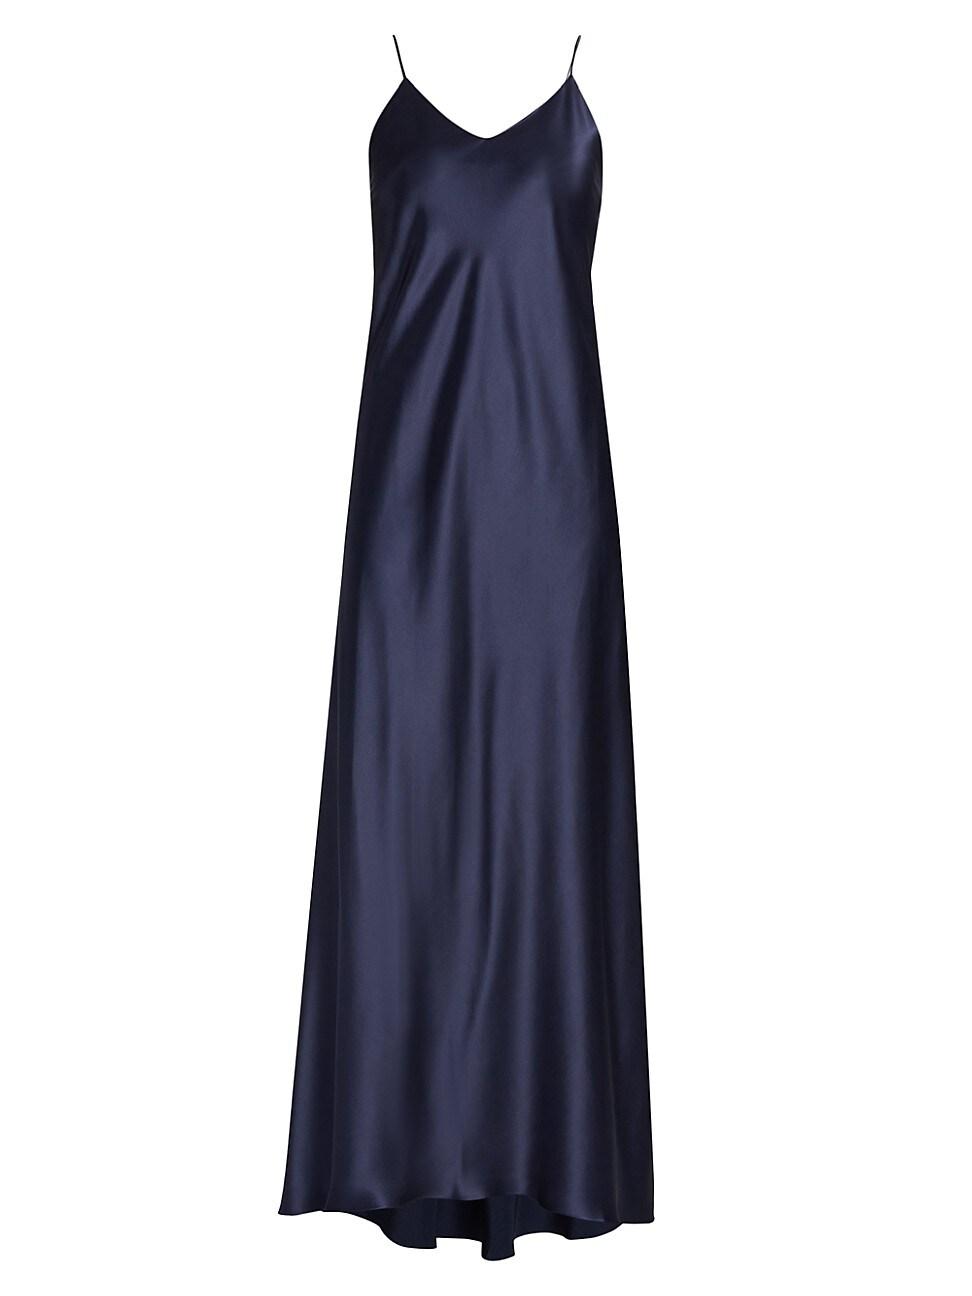 Adriana Iglesias WOMEN'S JADI SILK SLIP DRESS